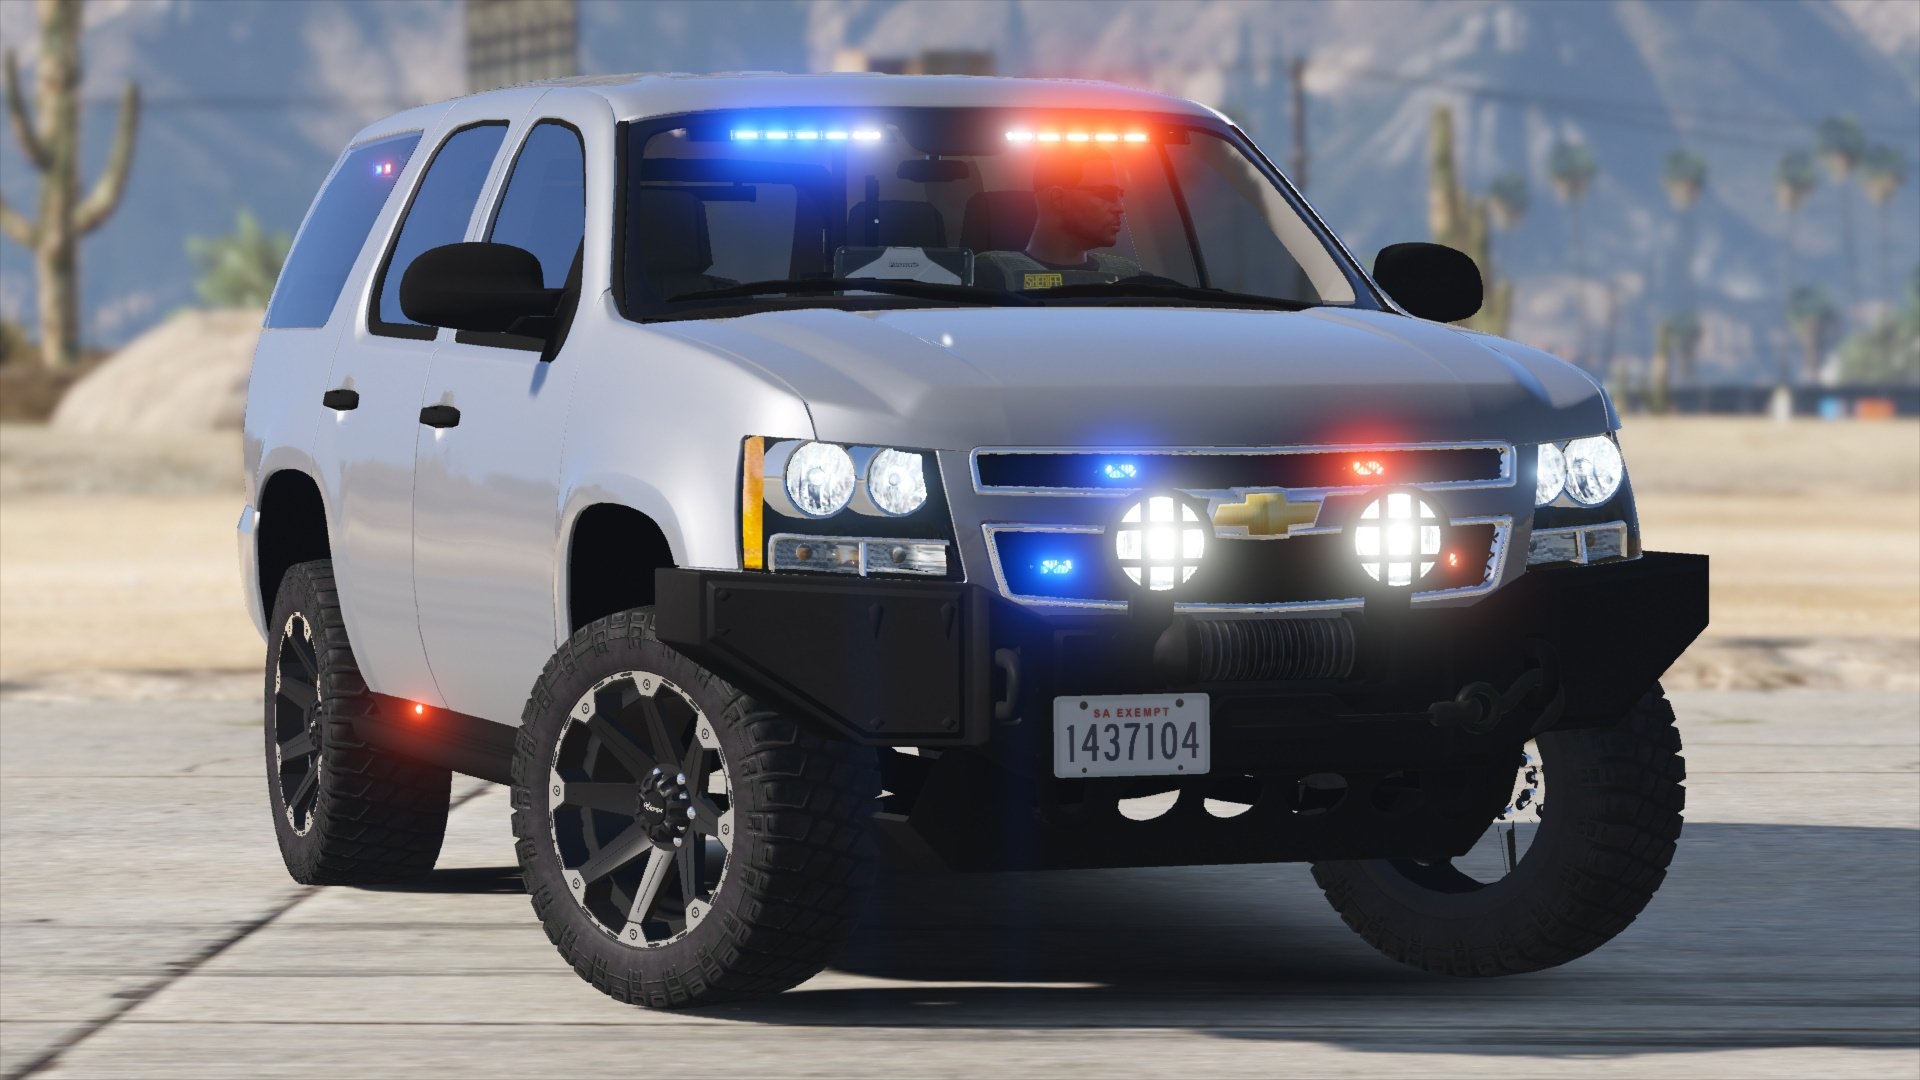 GTA 5 Vehicle Mods SUV Chevrolet GTA5 Mods